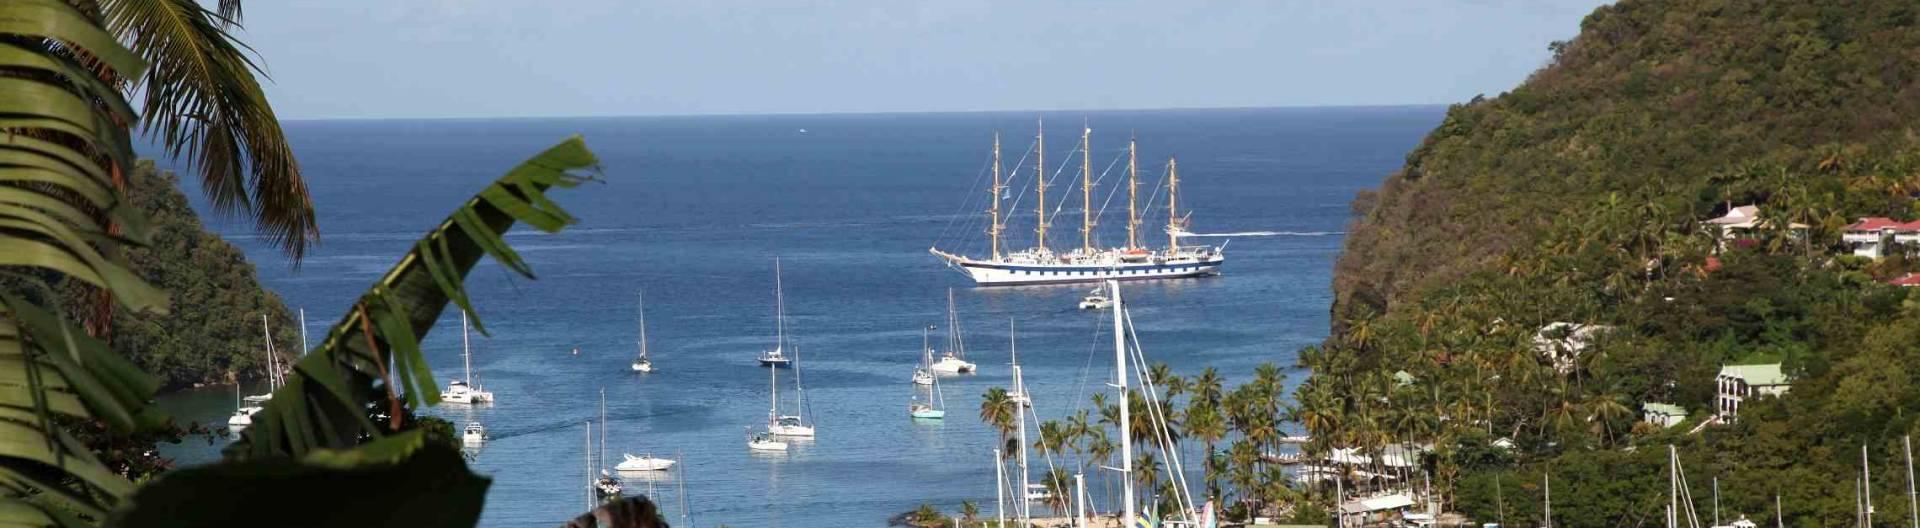 Marigot-Bay-St-Lucia-1920x528.jpg